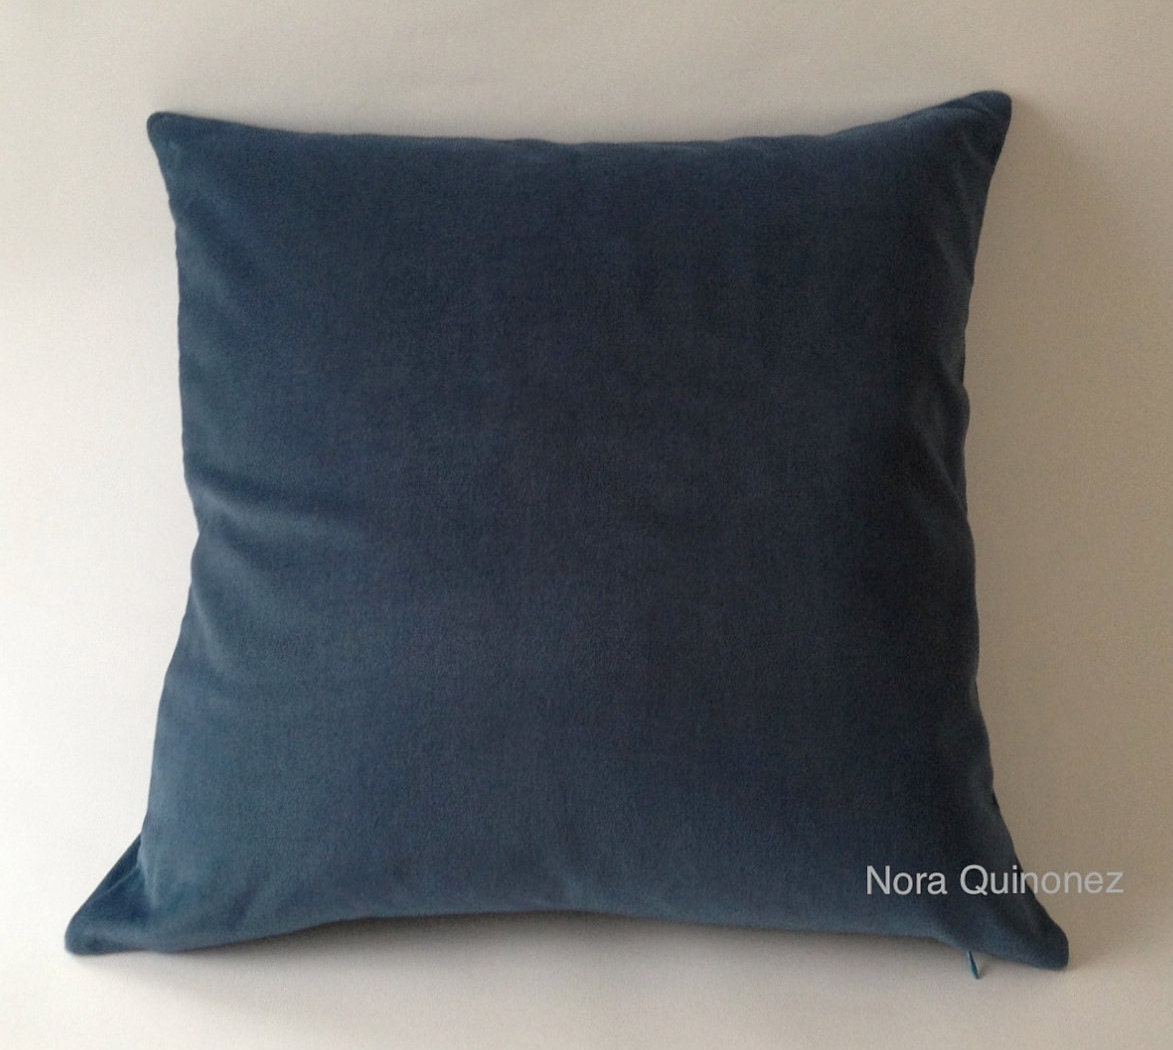 Teal Blue Cotton Velvet Pillow Cover Decorative Accent Throw